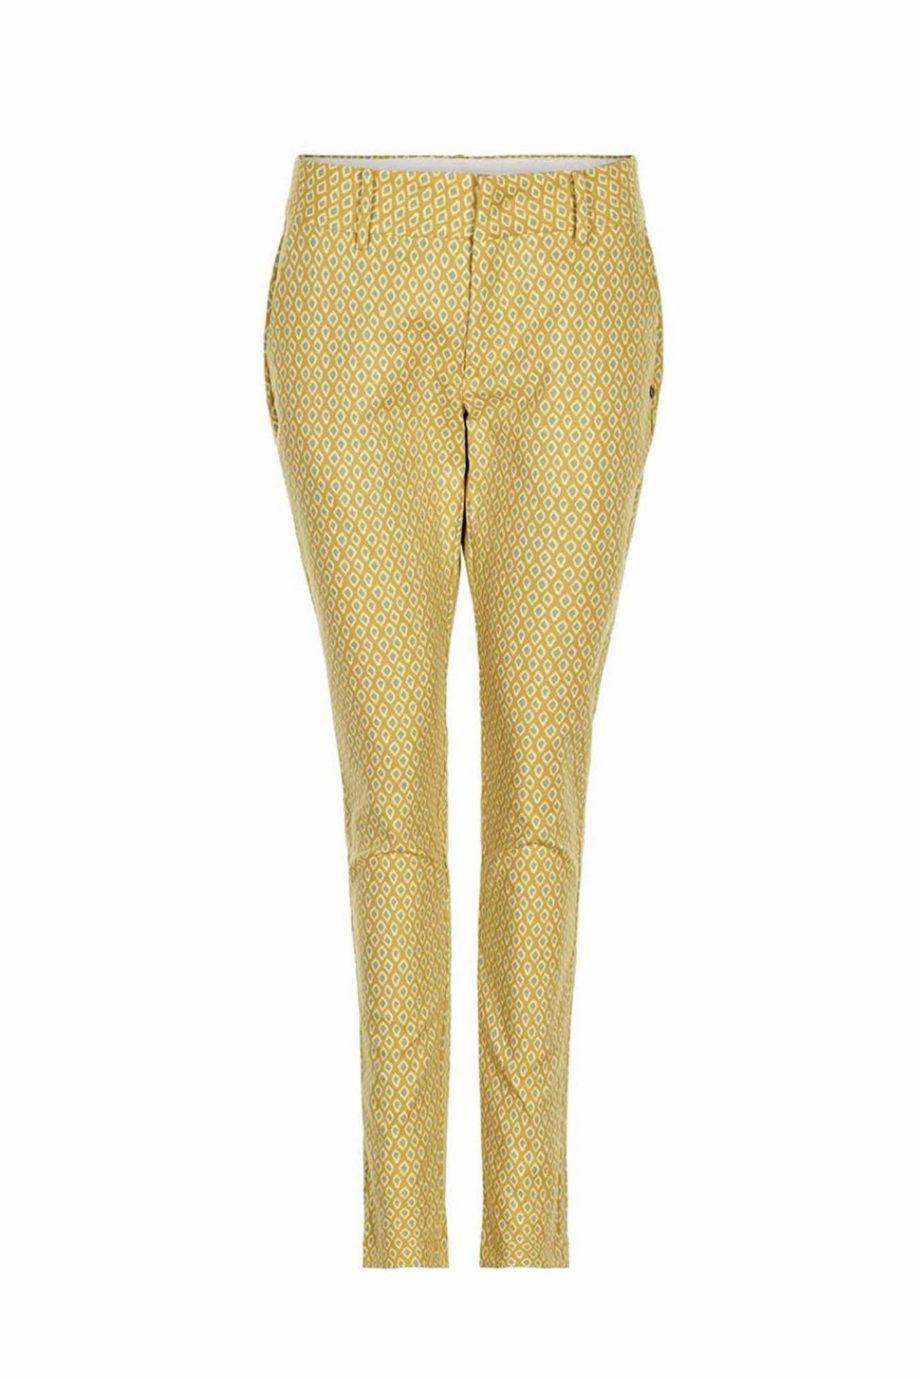 numph-pantalon-nubabasan